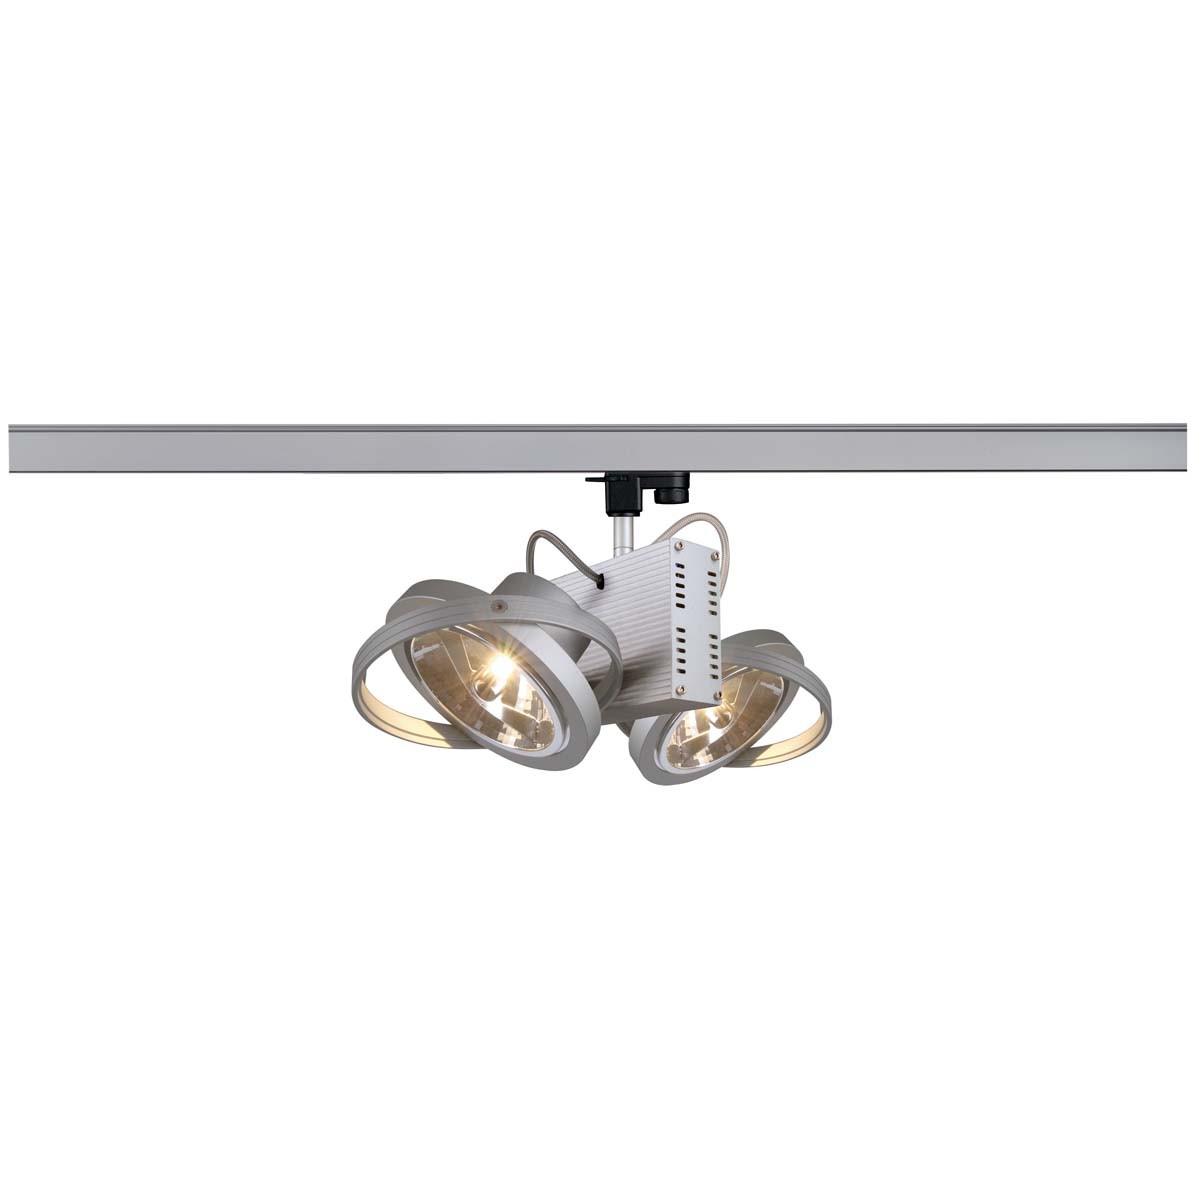 SLV 153012 Tec 2 QRB 2x50W Silver Grey Eutrac 3 Circuit 240V Track Light